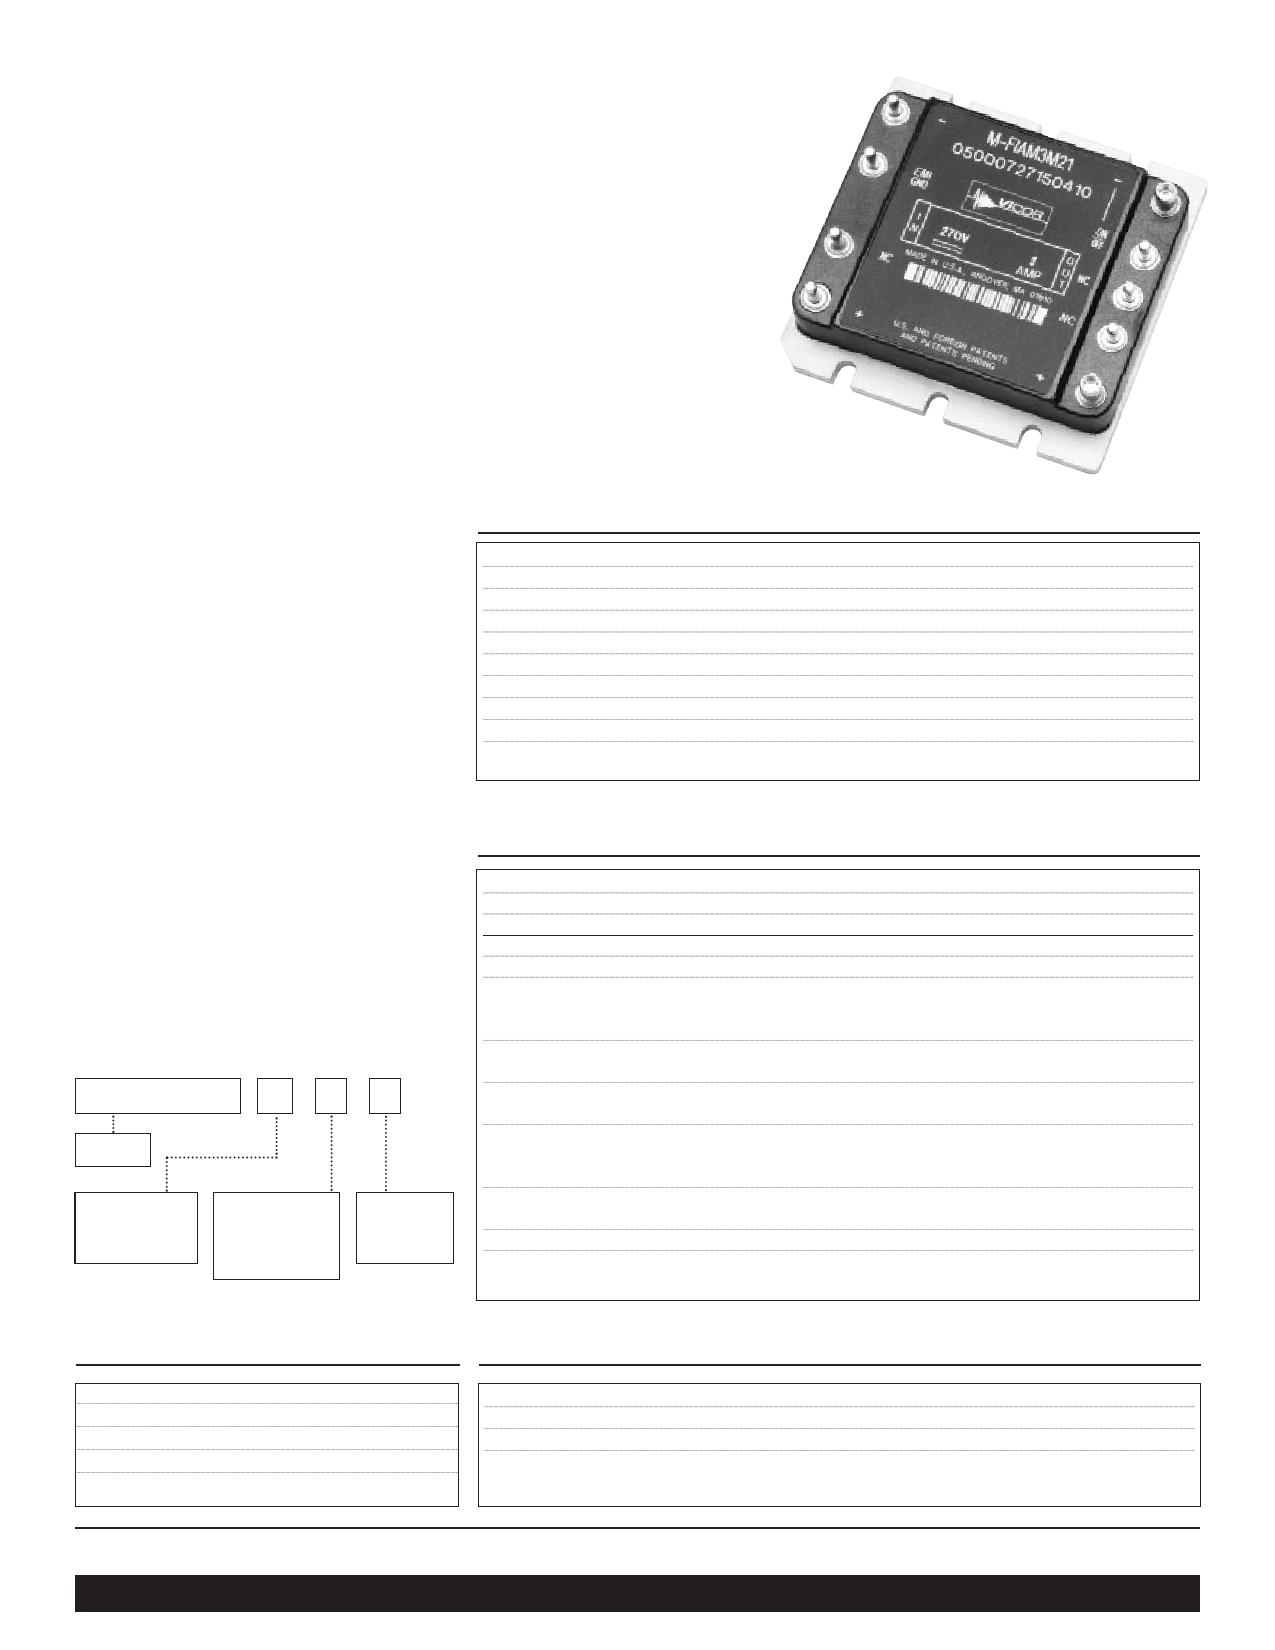 M-FIAM3M12 datasheet